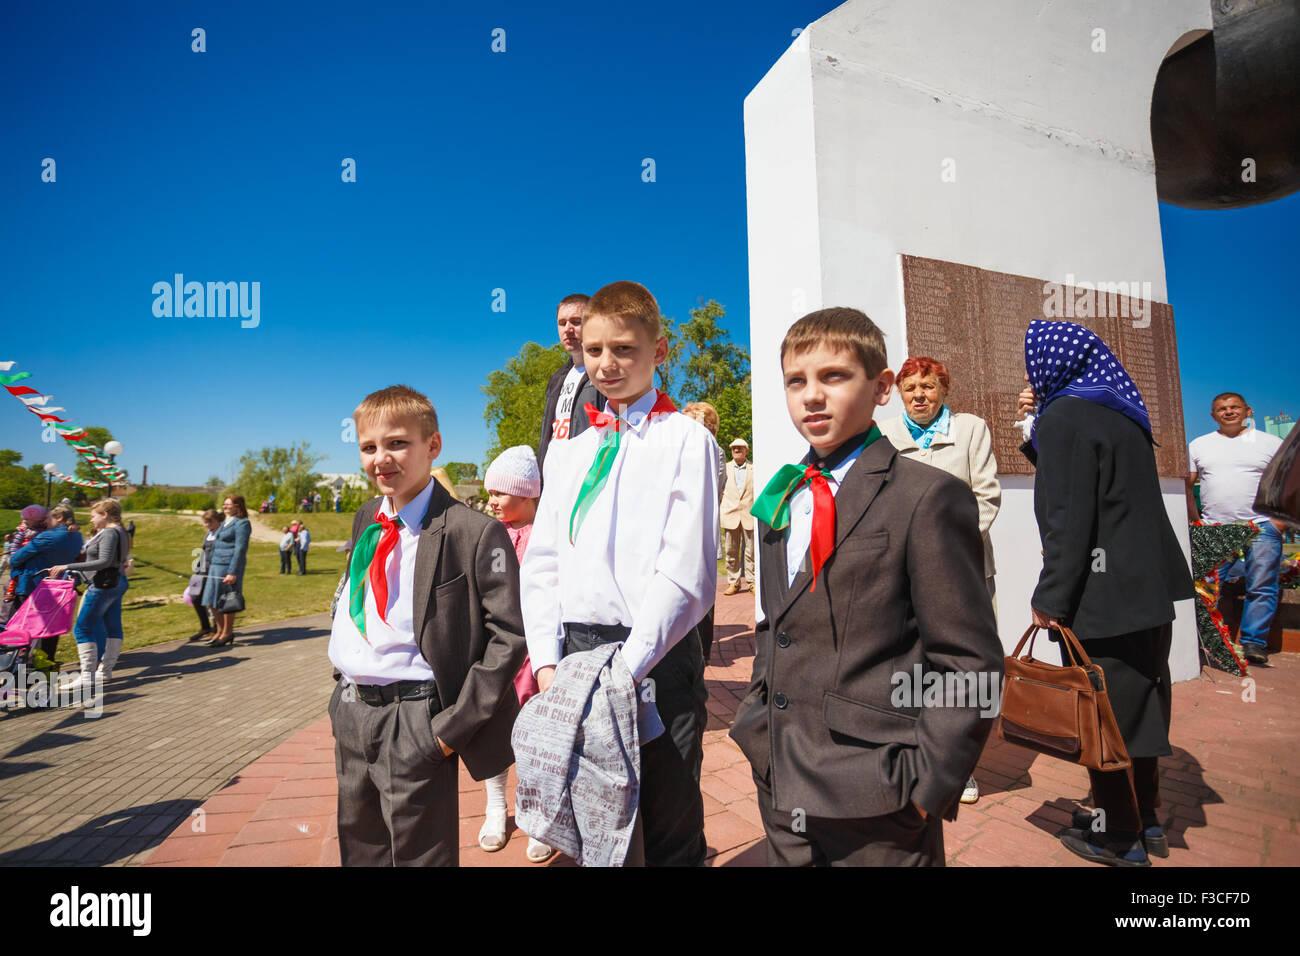 Dobrush (Gomel region), BELARUS - MAY 9, 2014: Unidentified Belarusian schoolchildren on the Victory Day parade - Stock Image